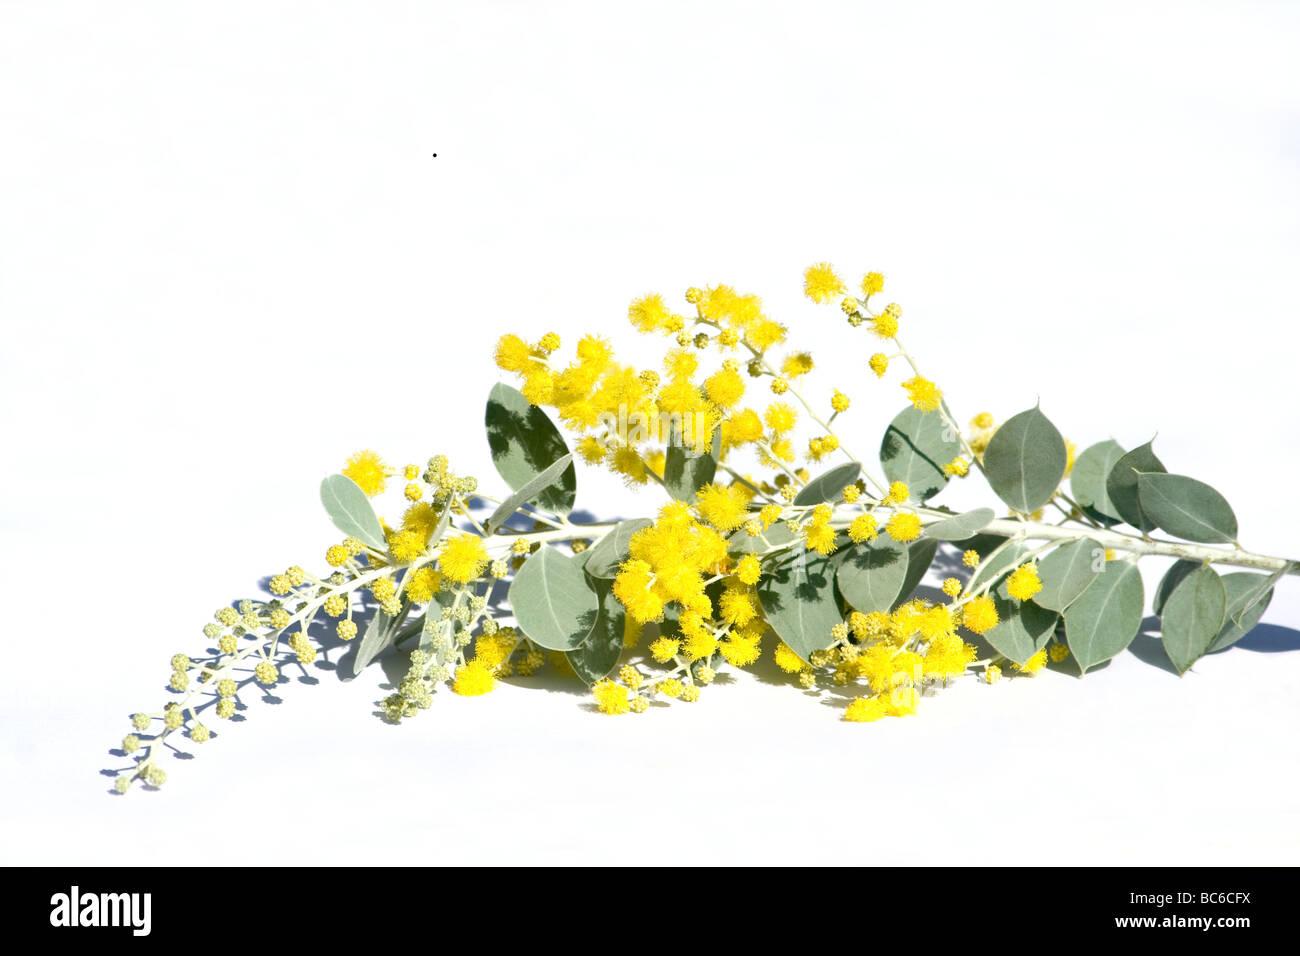 Acacia flowers close-up on white background - Stock Image